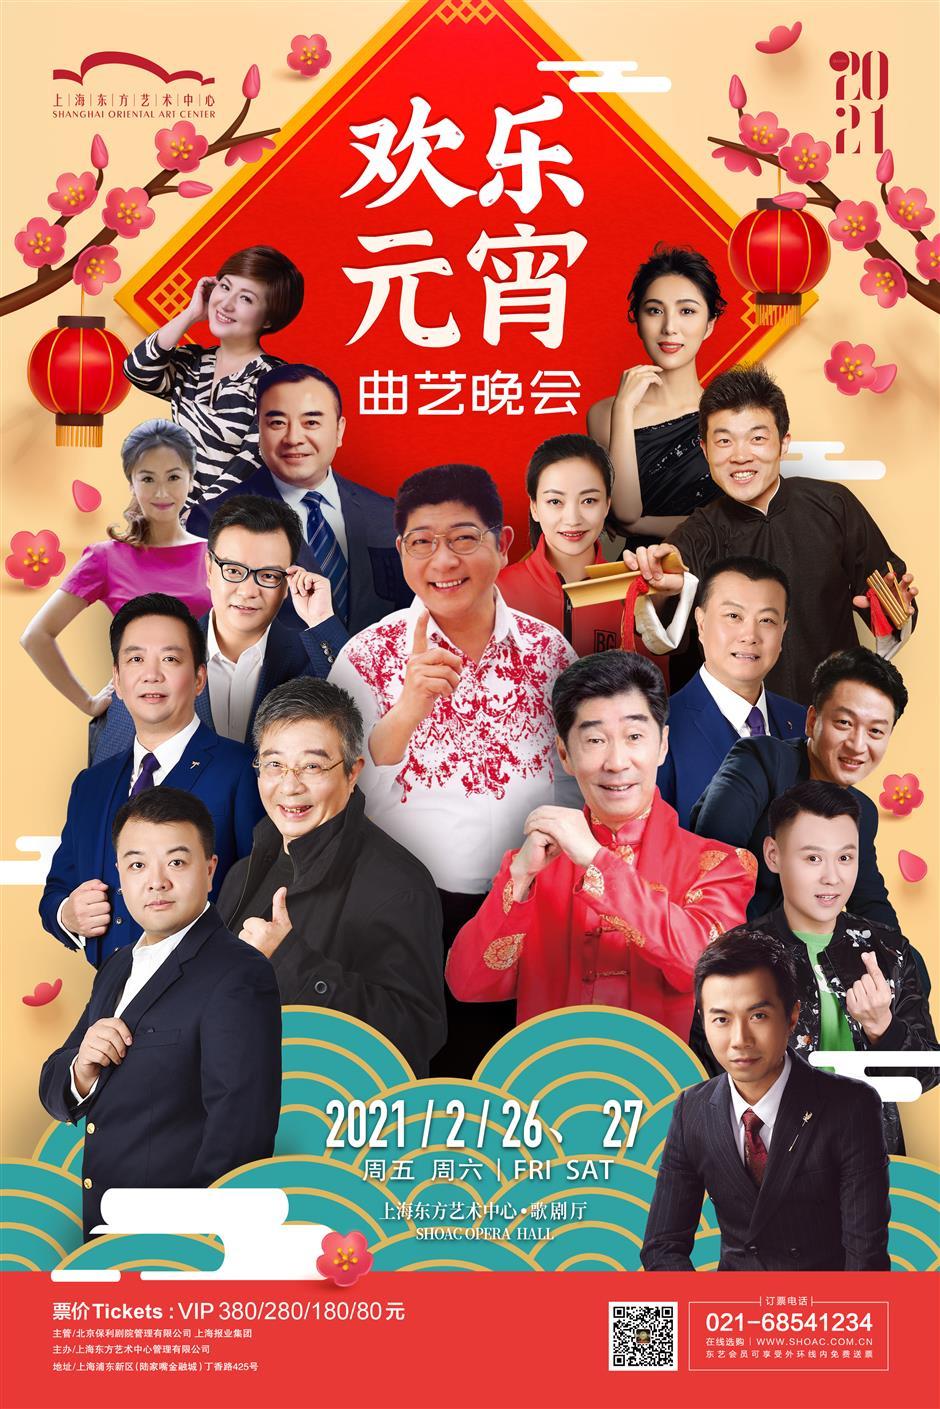 Shanghai farce shows celebrate Lantern Festival